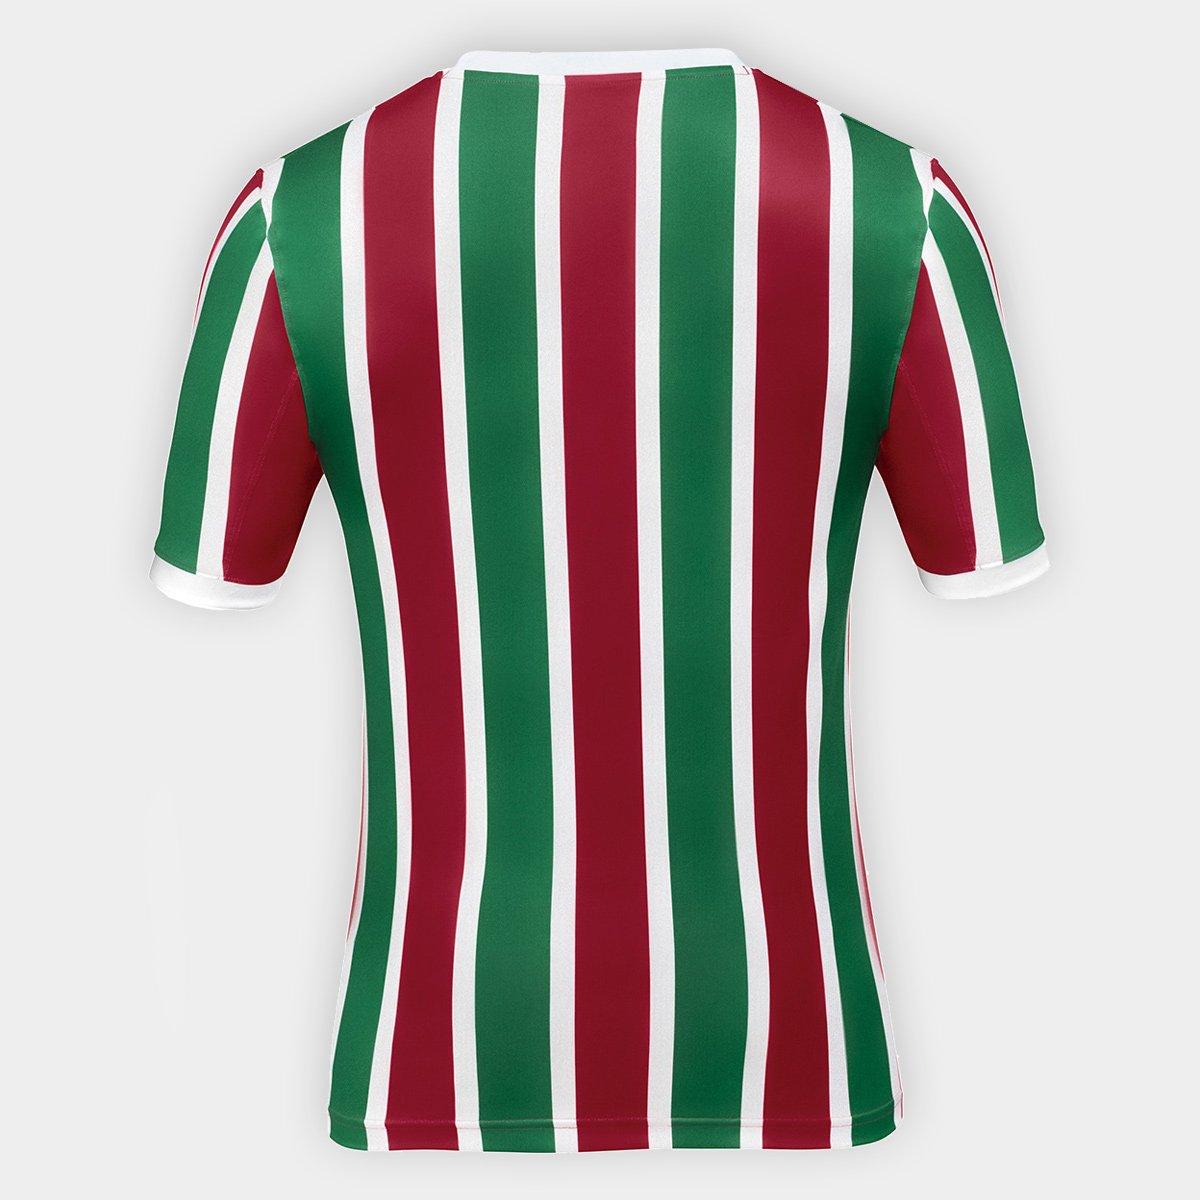 08553549e1 Camisa Fluminense I 17 18 s nº Torcedor Under Armour Masculina ...